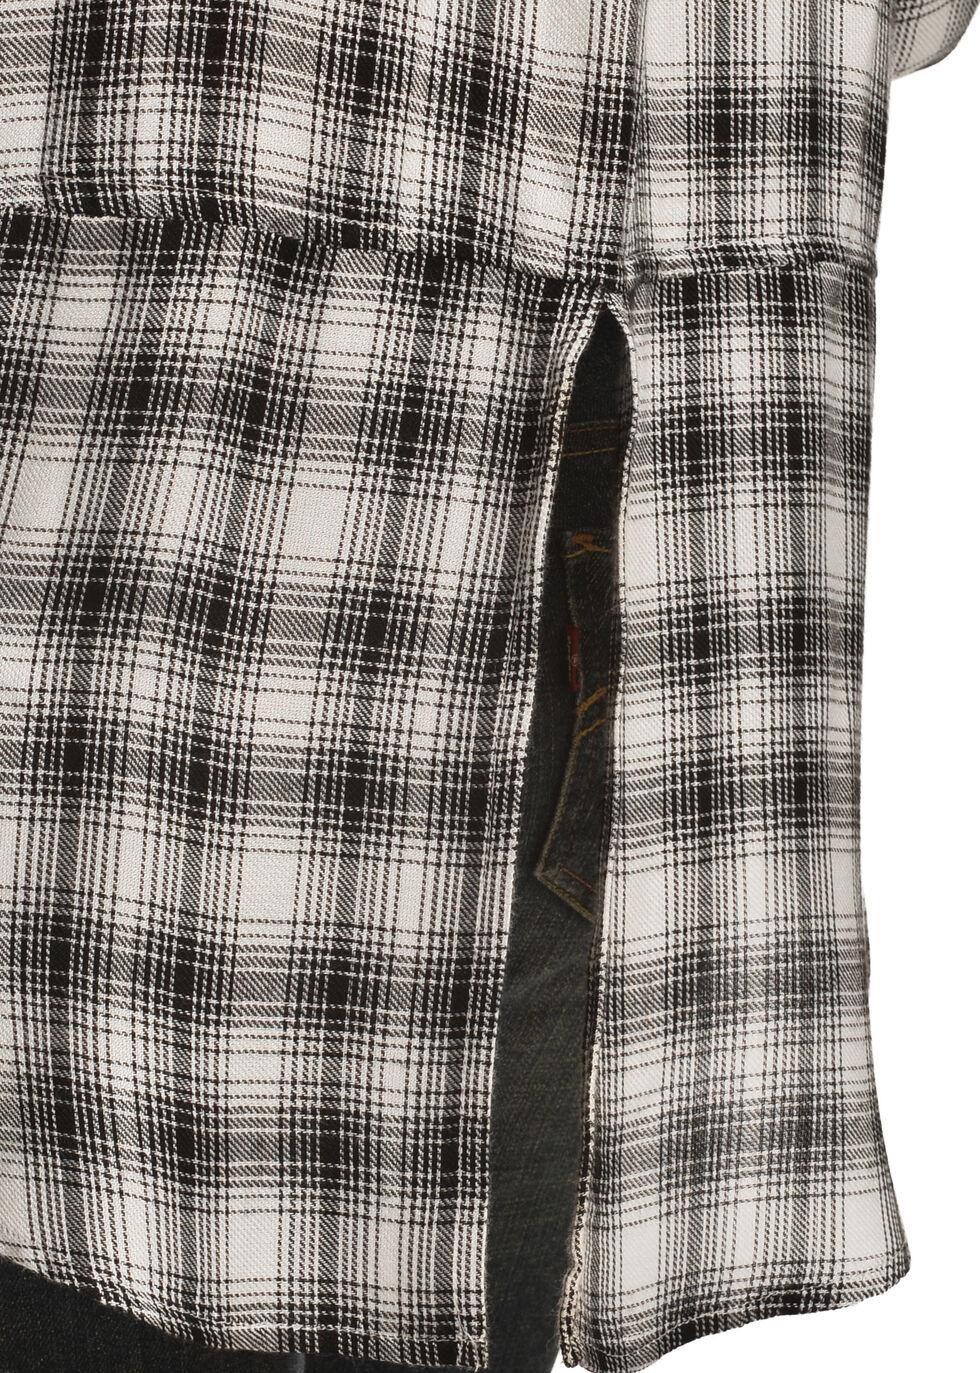 New Direction Women's Black & White Plaid Western Shirt, Blk/white, hi-res